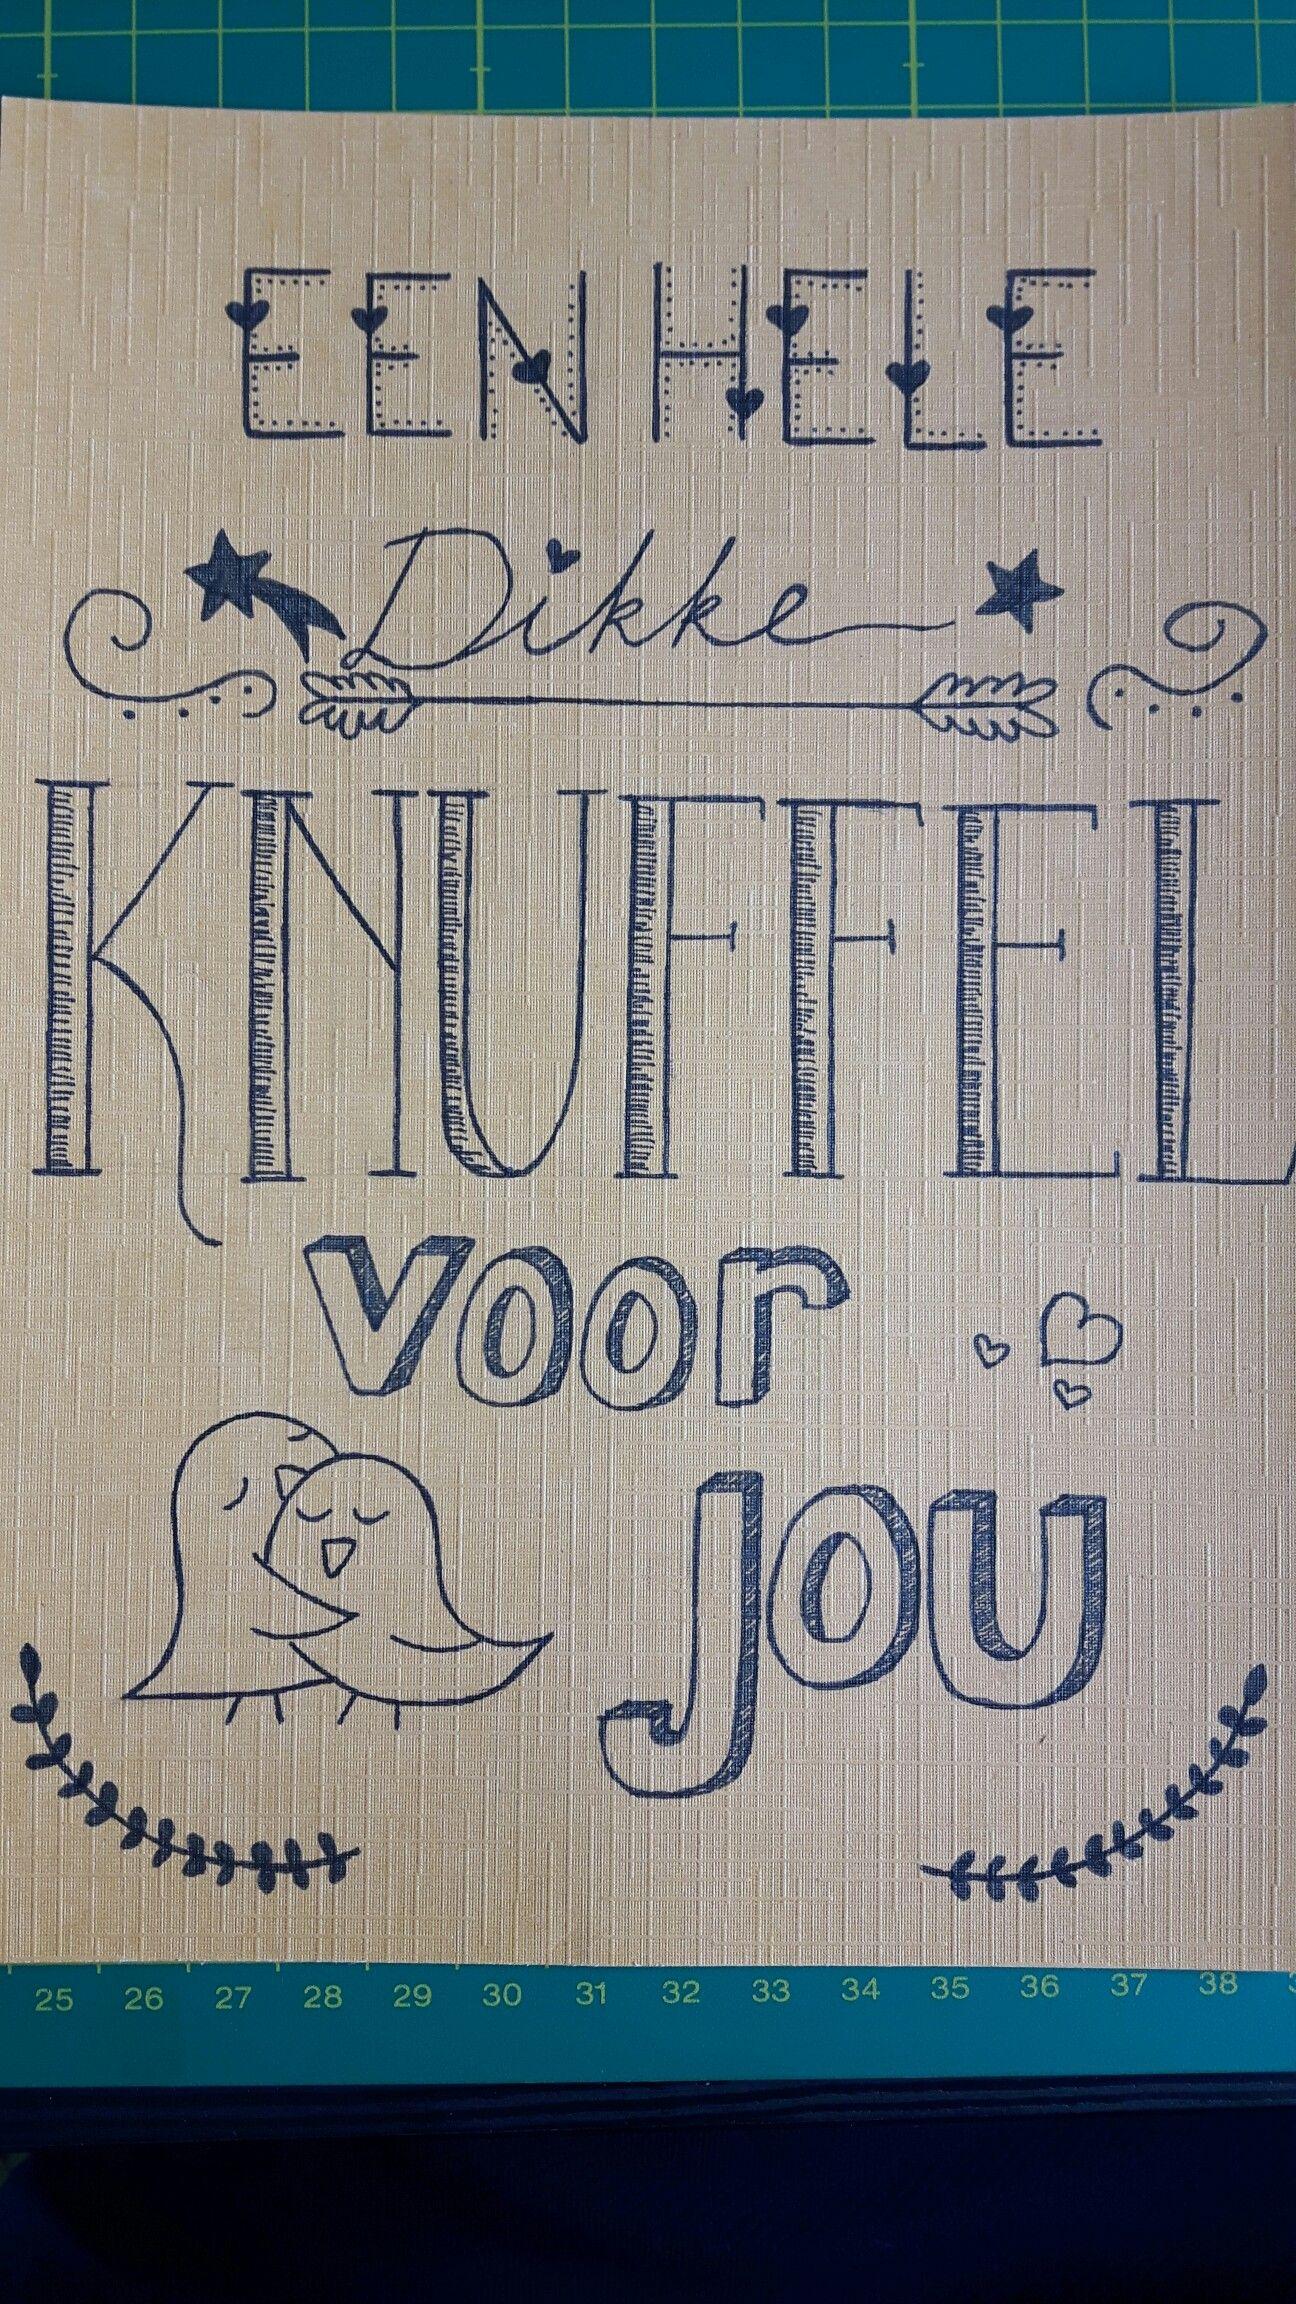 Een hele dikke knuffel voor jou! #knuffelvoorjou